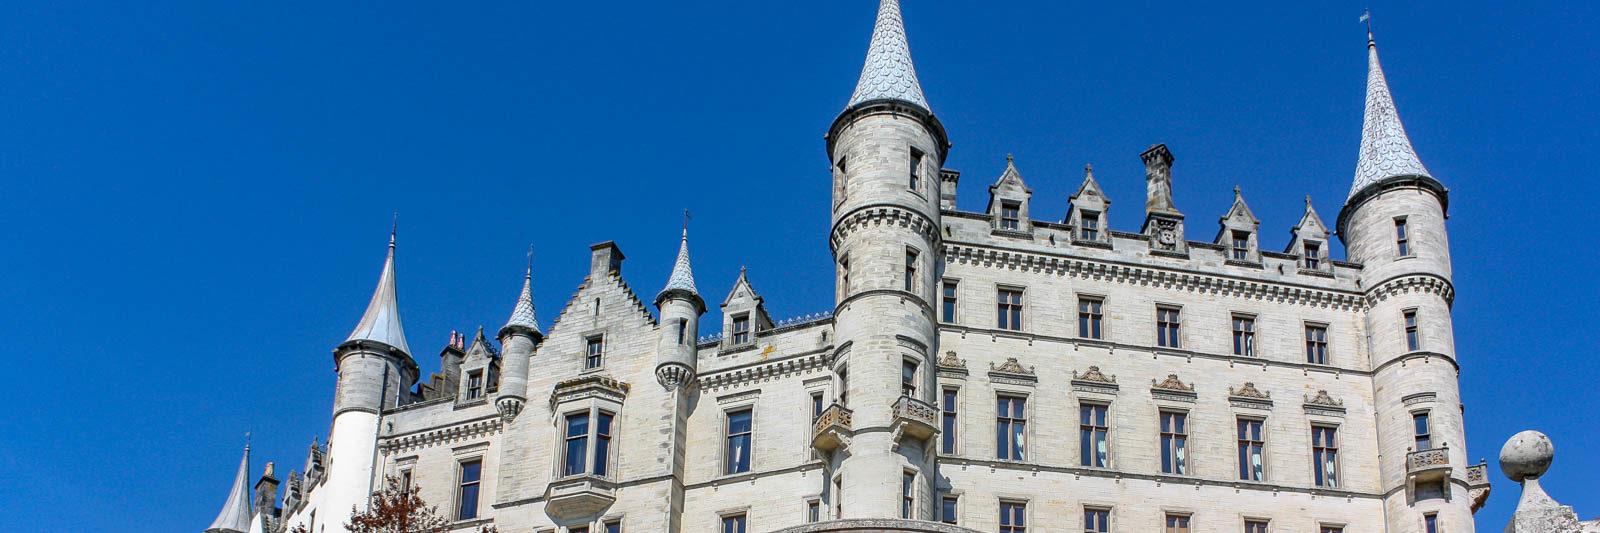 Dunrobin Castle on a Scotland road trip